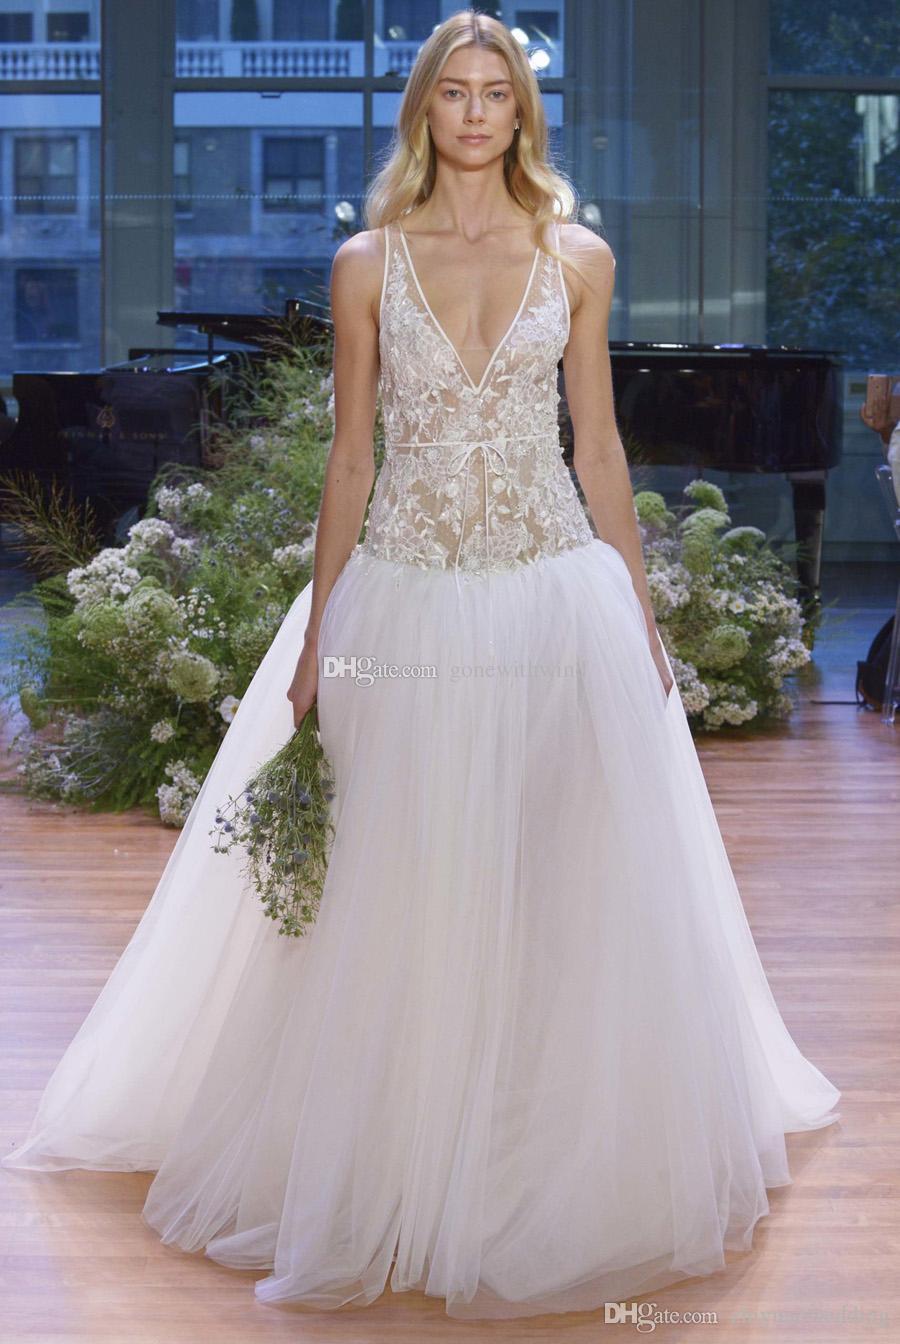 Dropwaist Tulle Ball Gown Wedding Dresses 2017 Monique Lhuillier ...